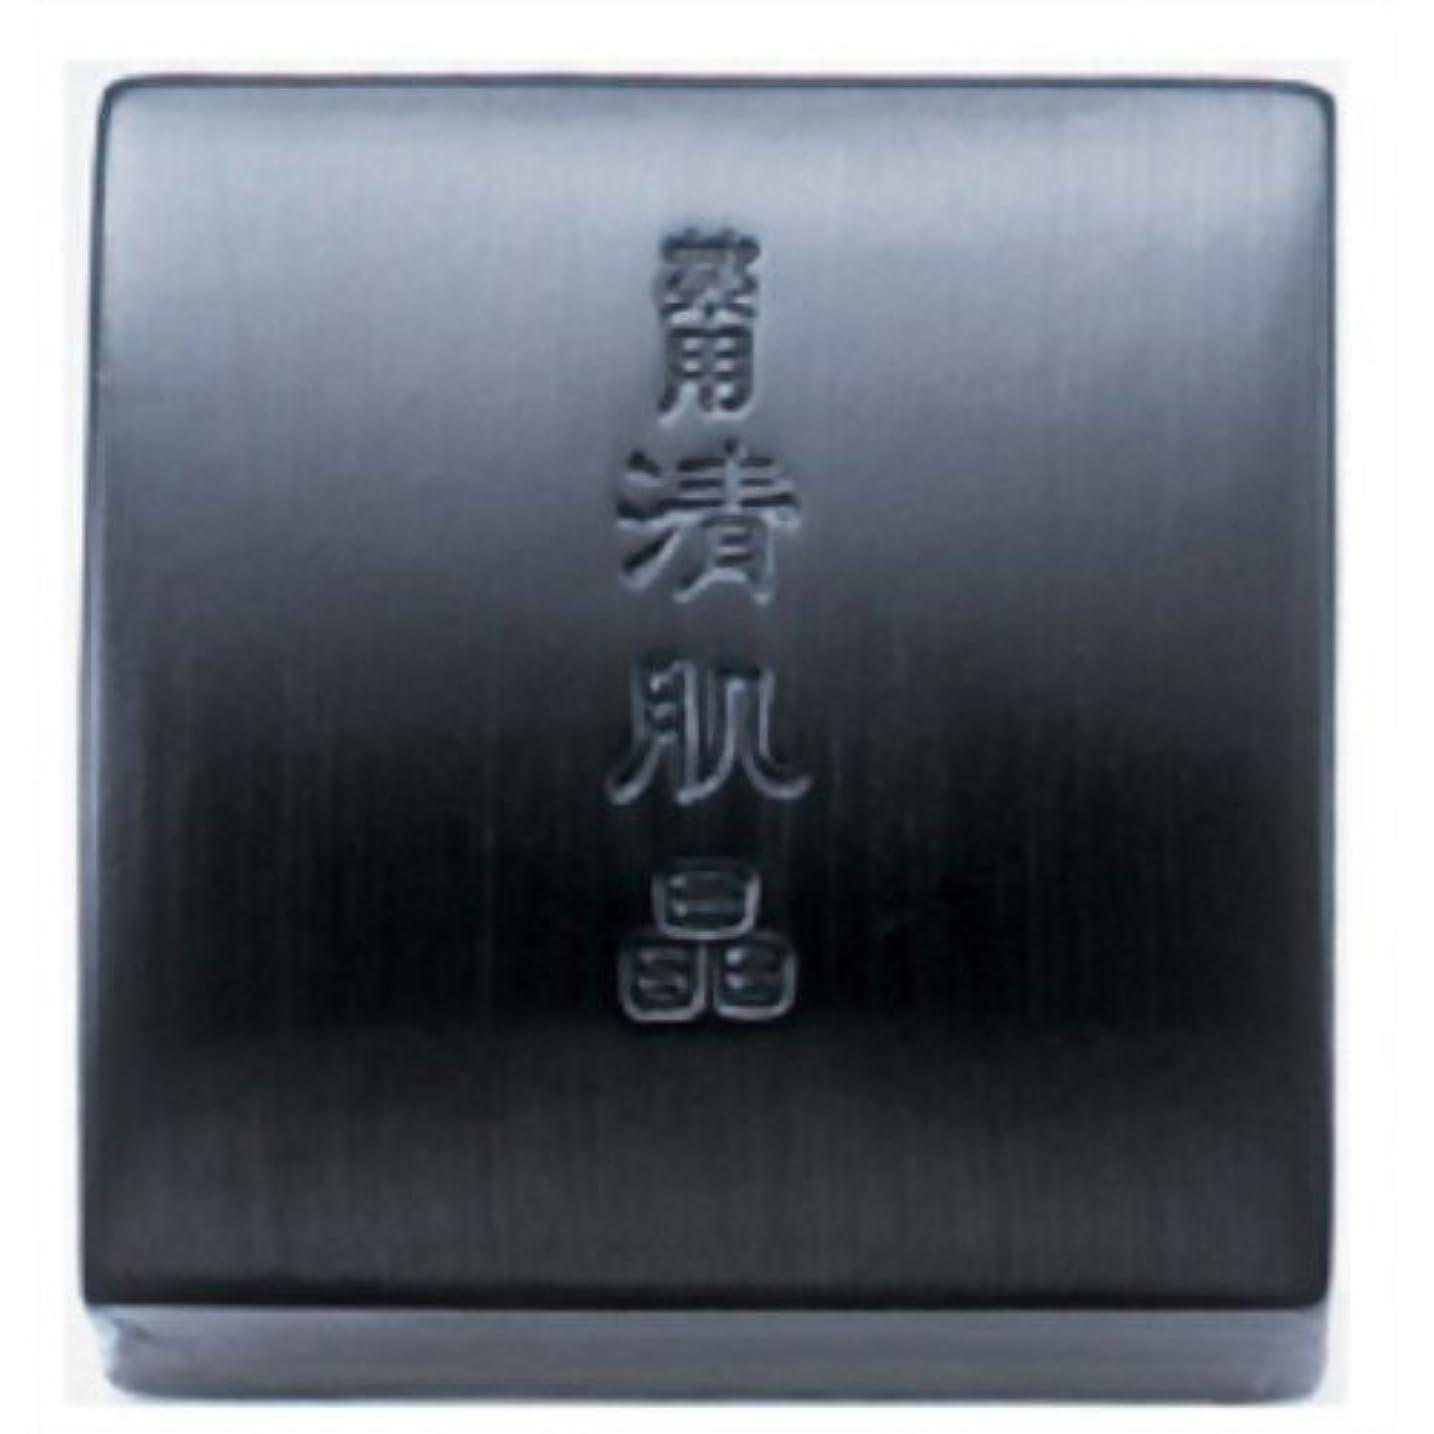 炭水化物適切に毎月コーセー 薬用 清肌晶 120g